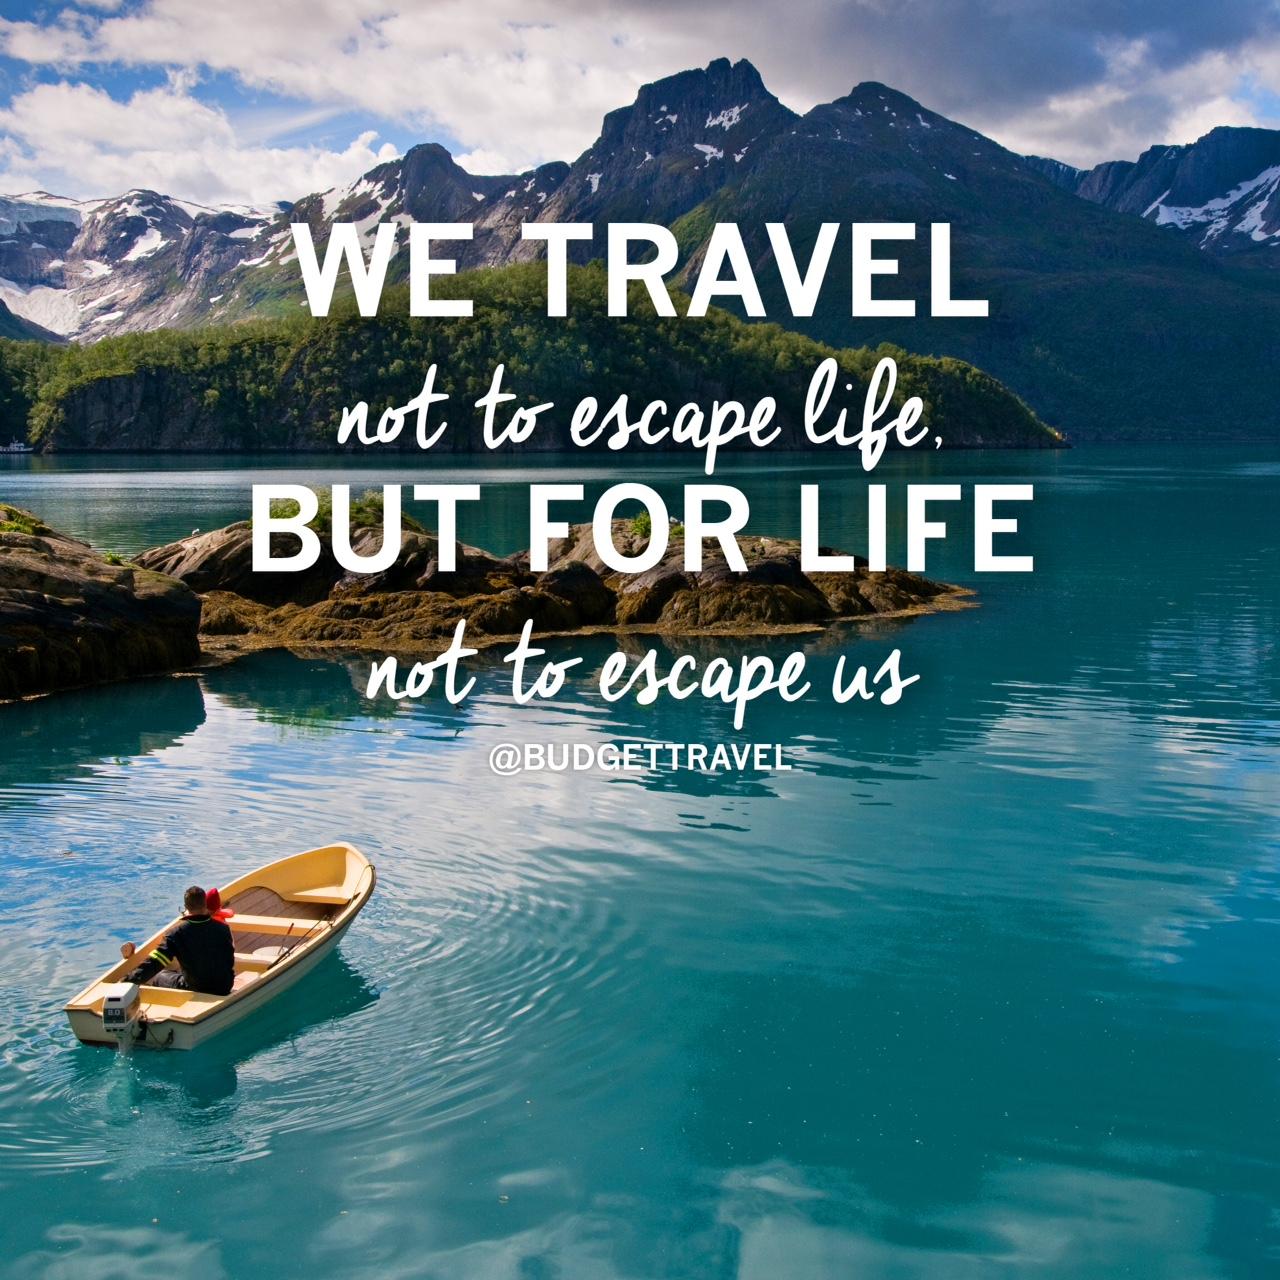 RV travel quote